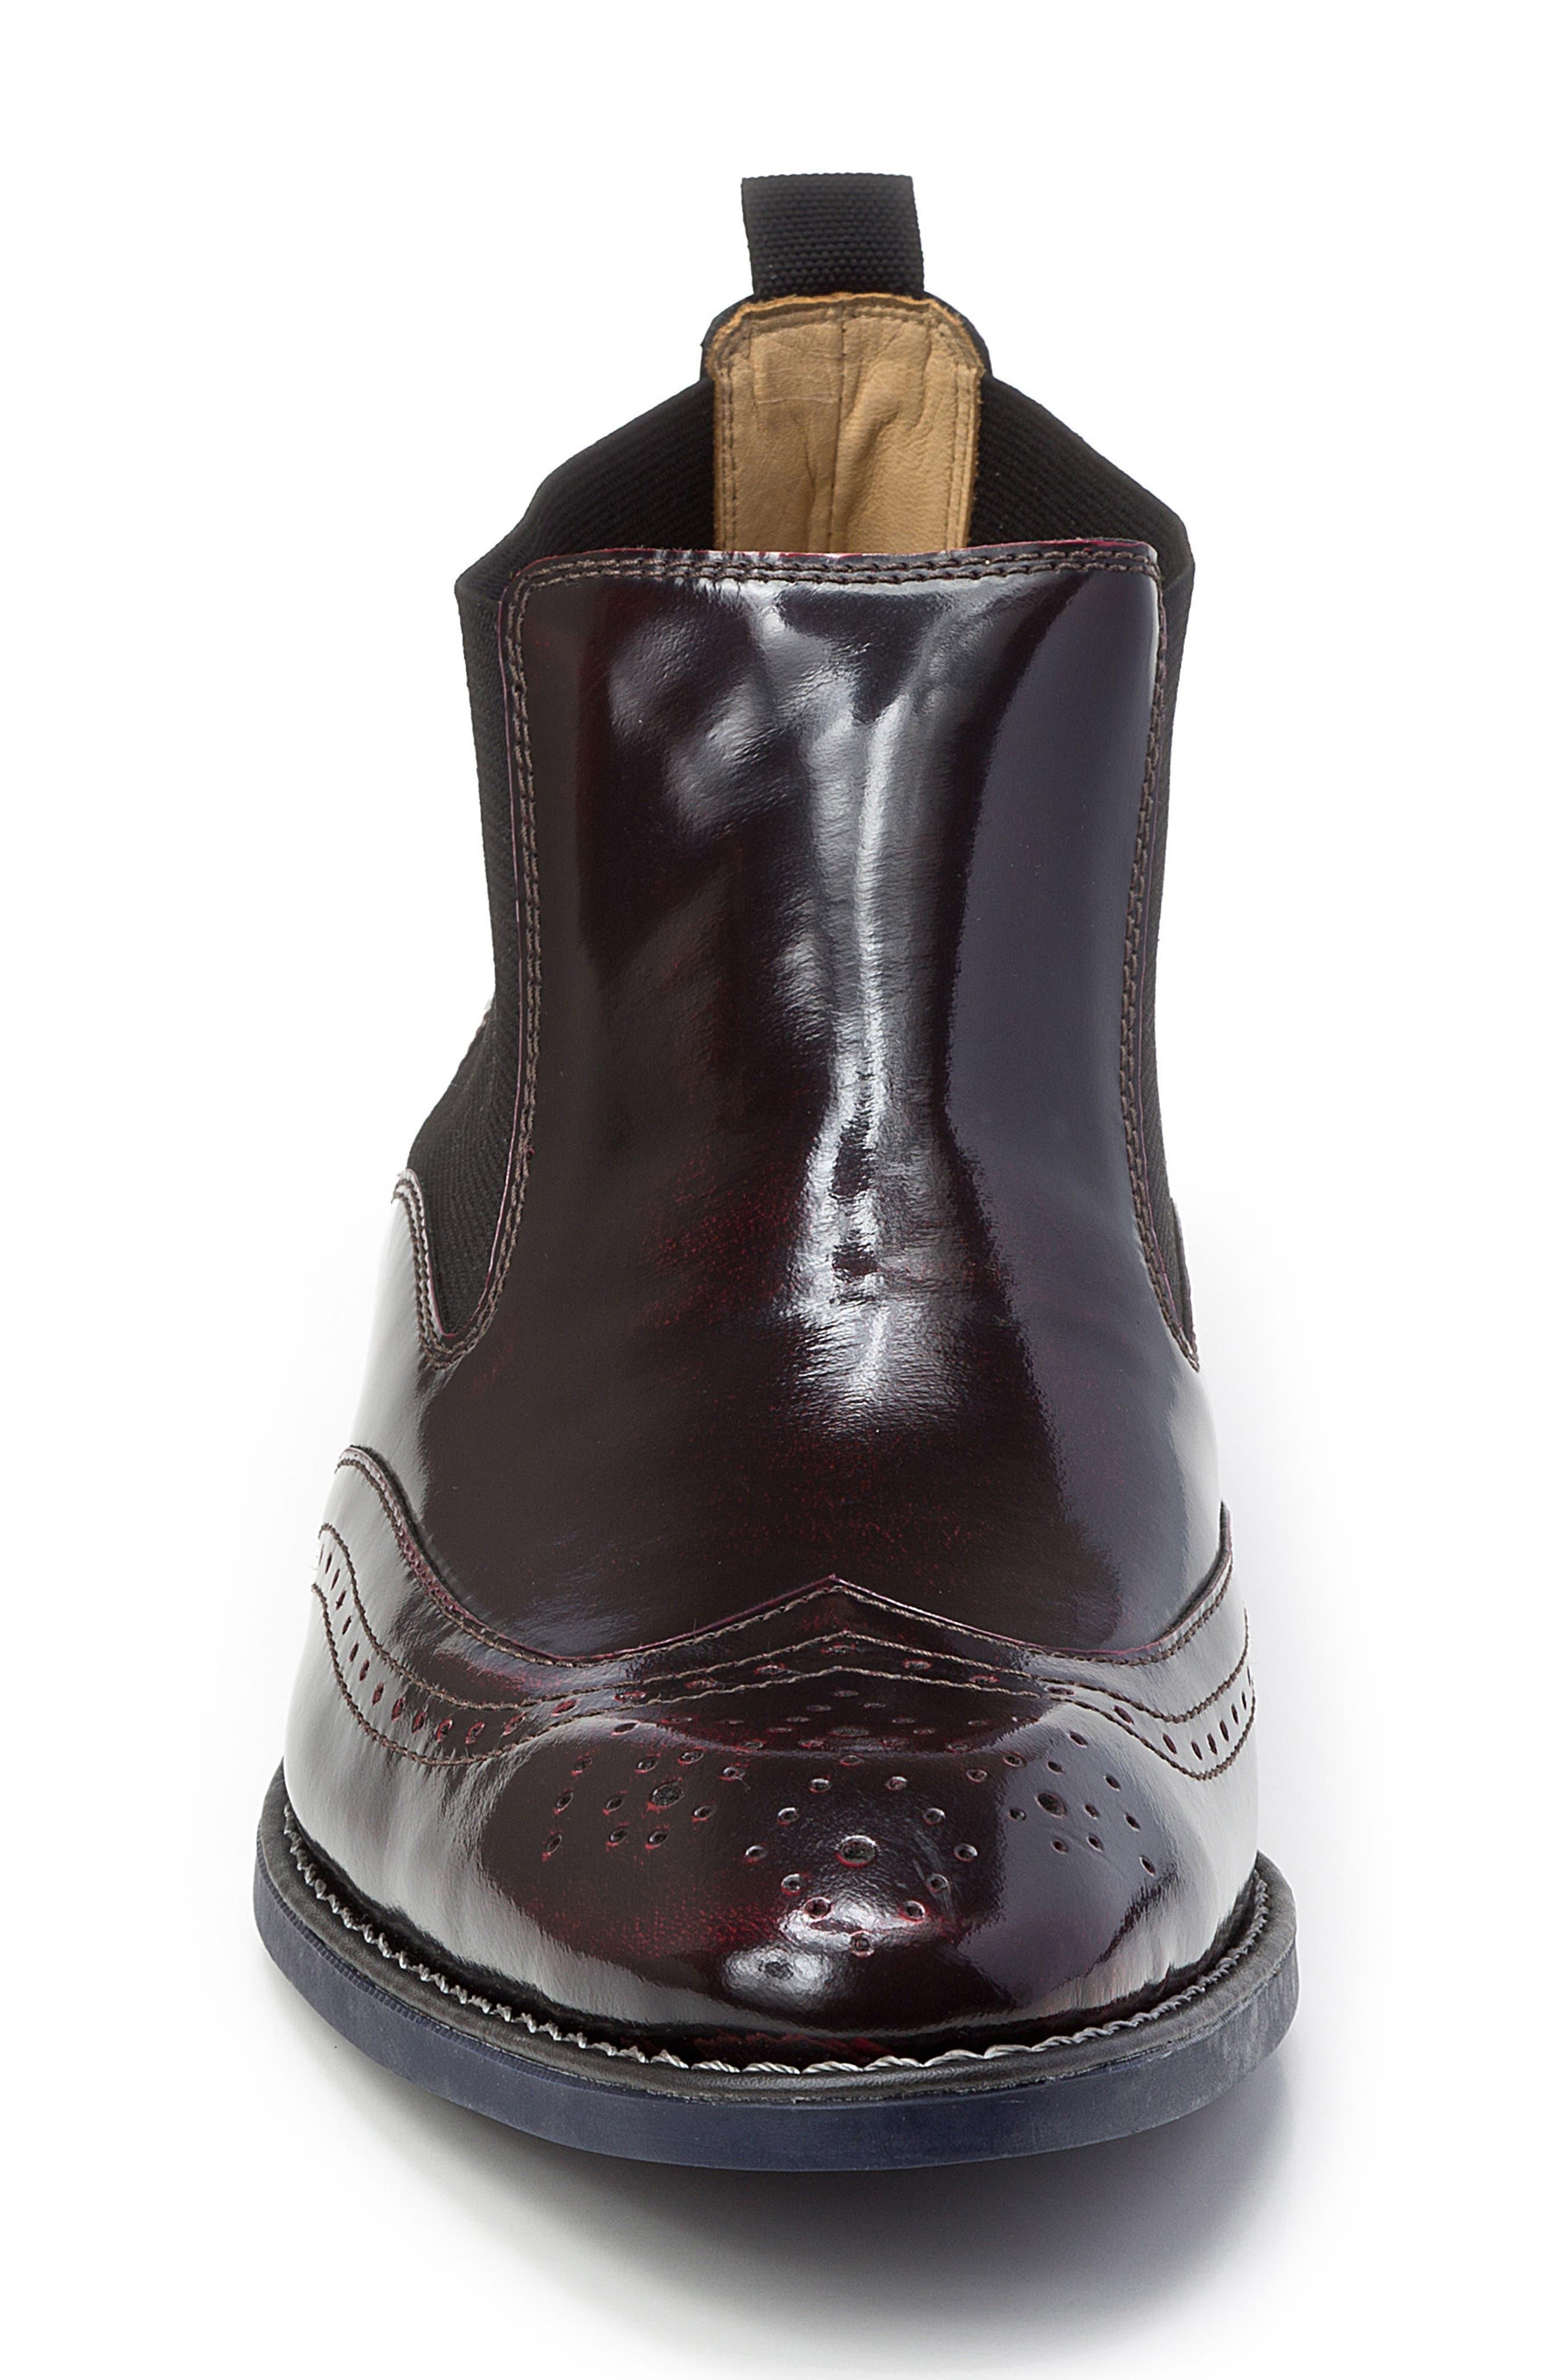 Emanuel Chelsea Boot,                             Alternate thumbnail 4, color,                             930